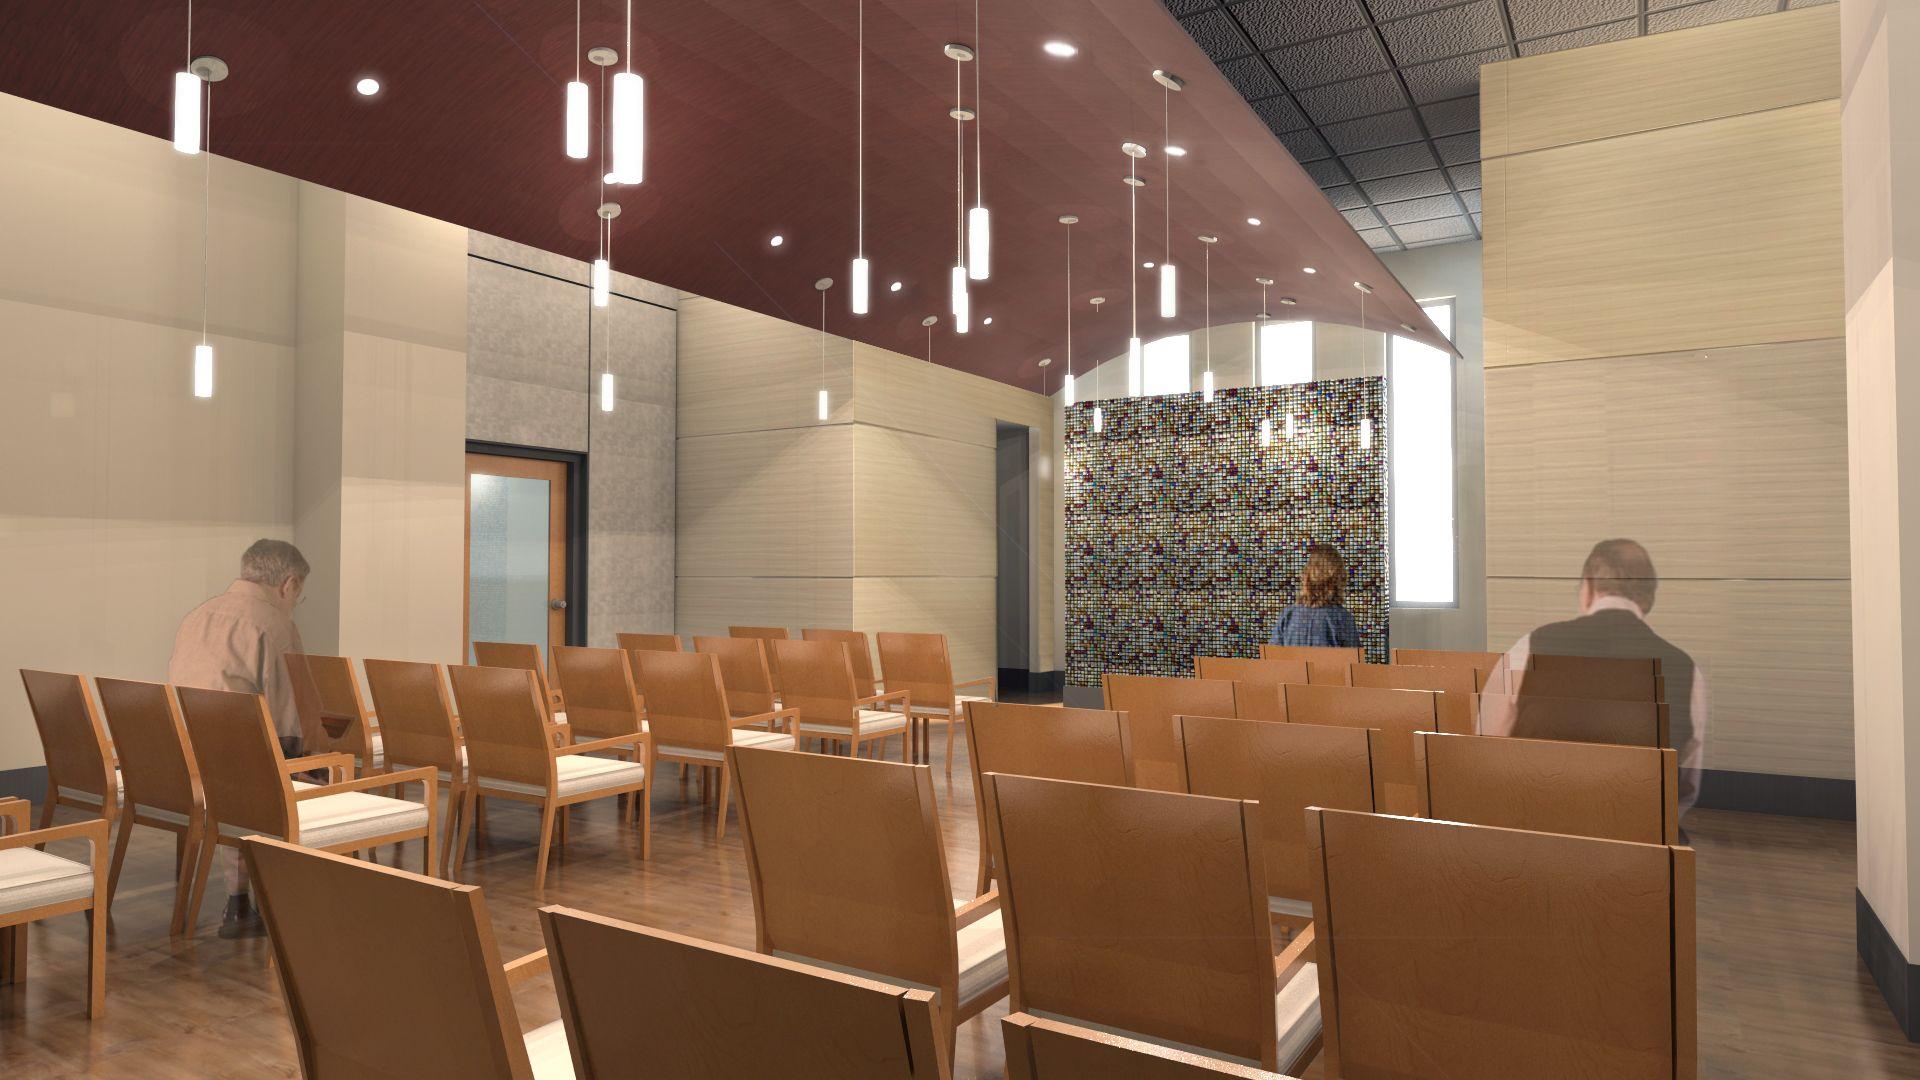 Chapel Healthcare design, Meditation rooms, Design